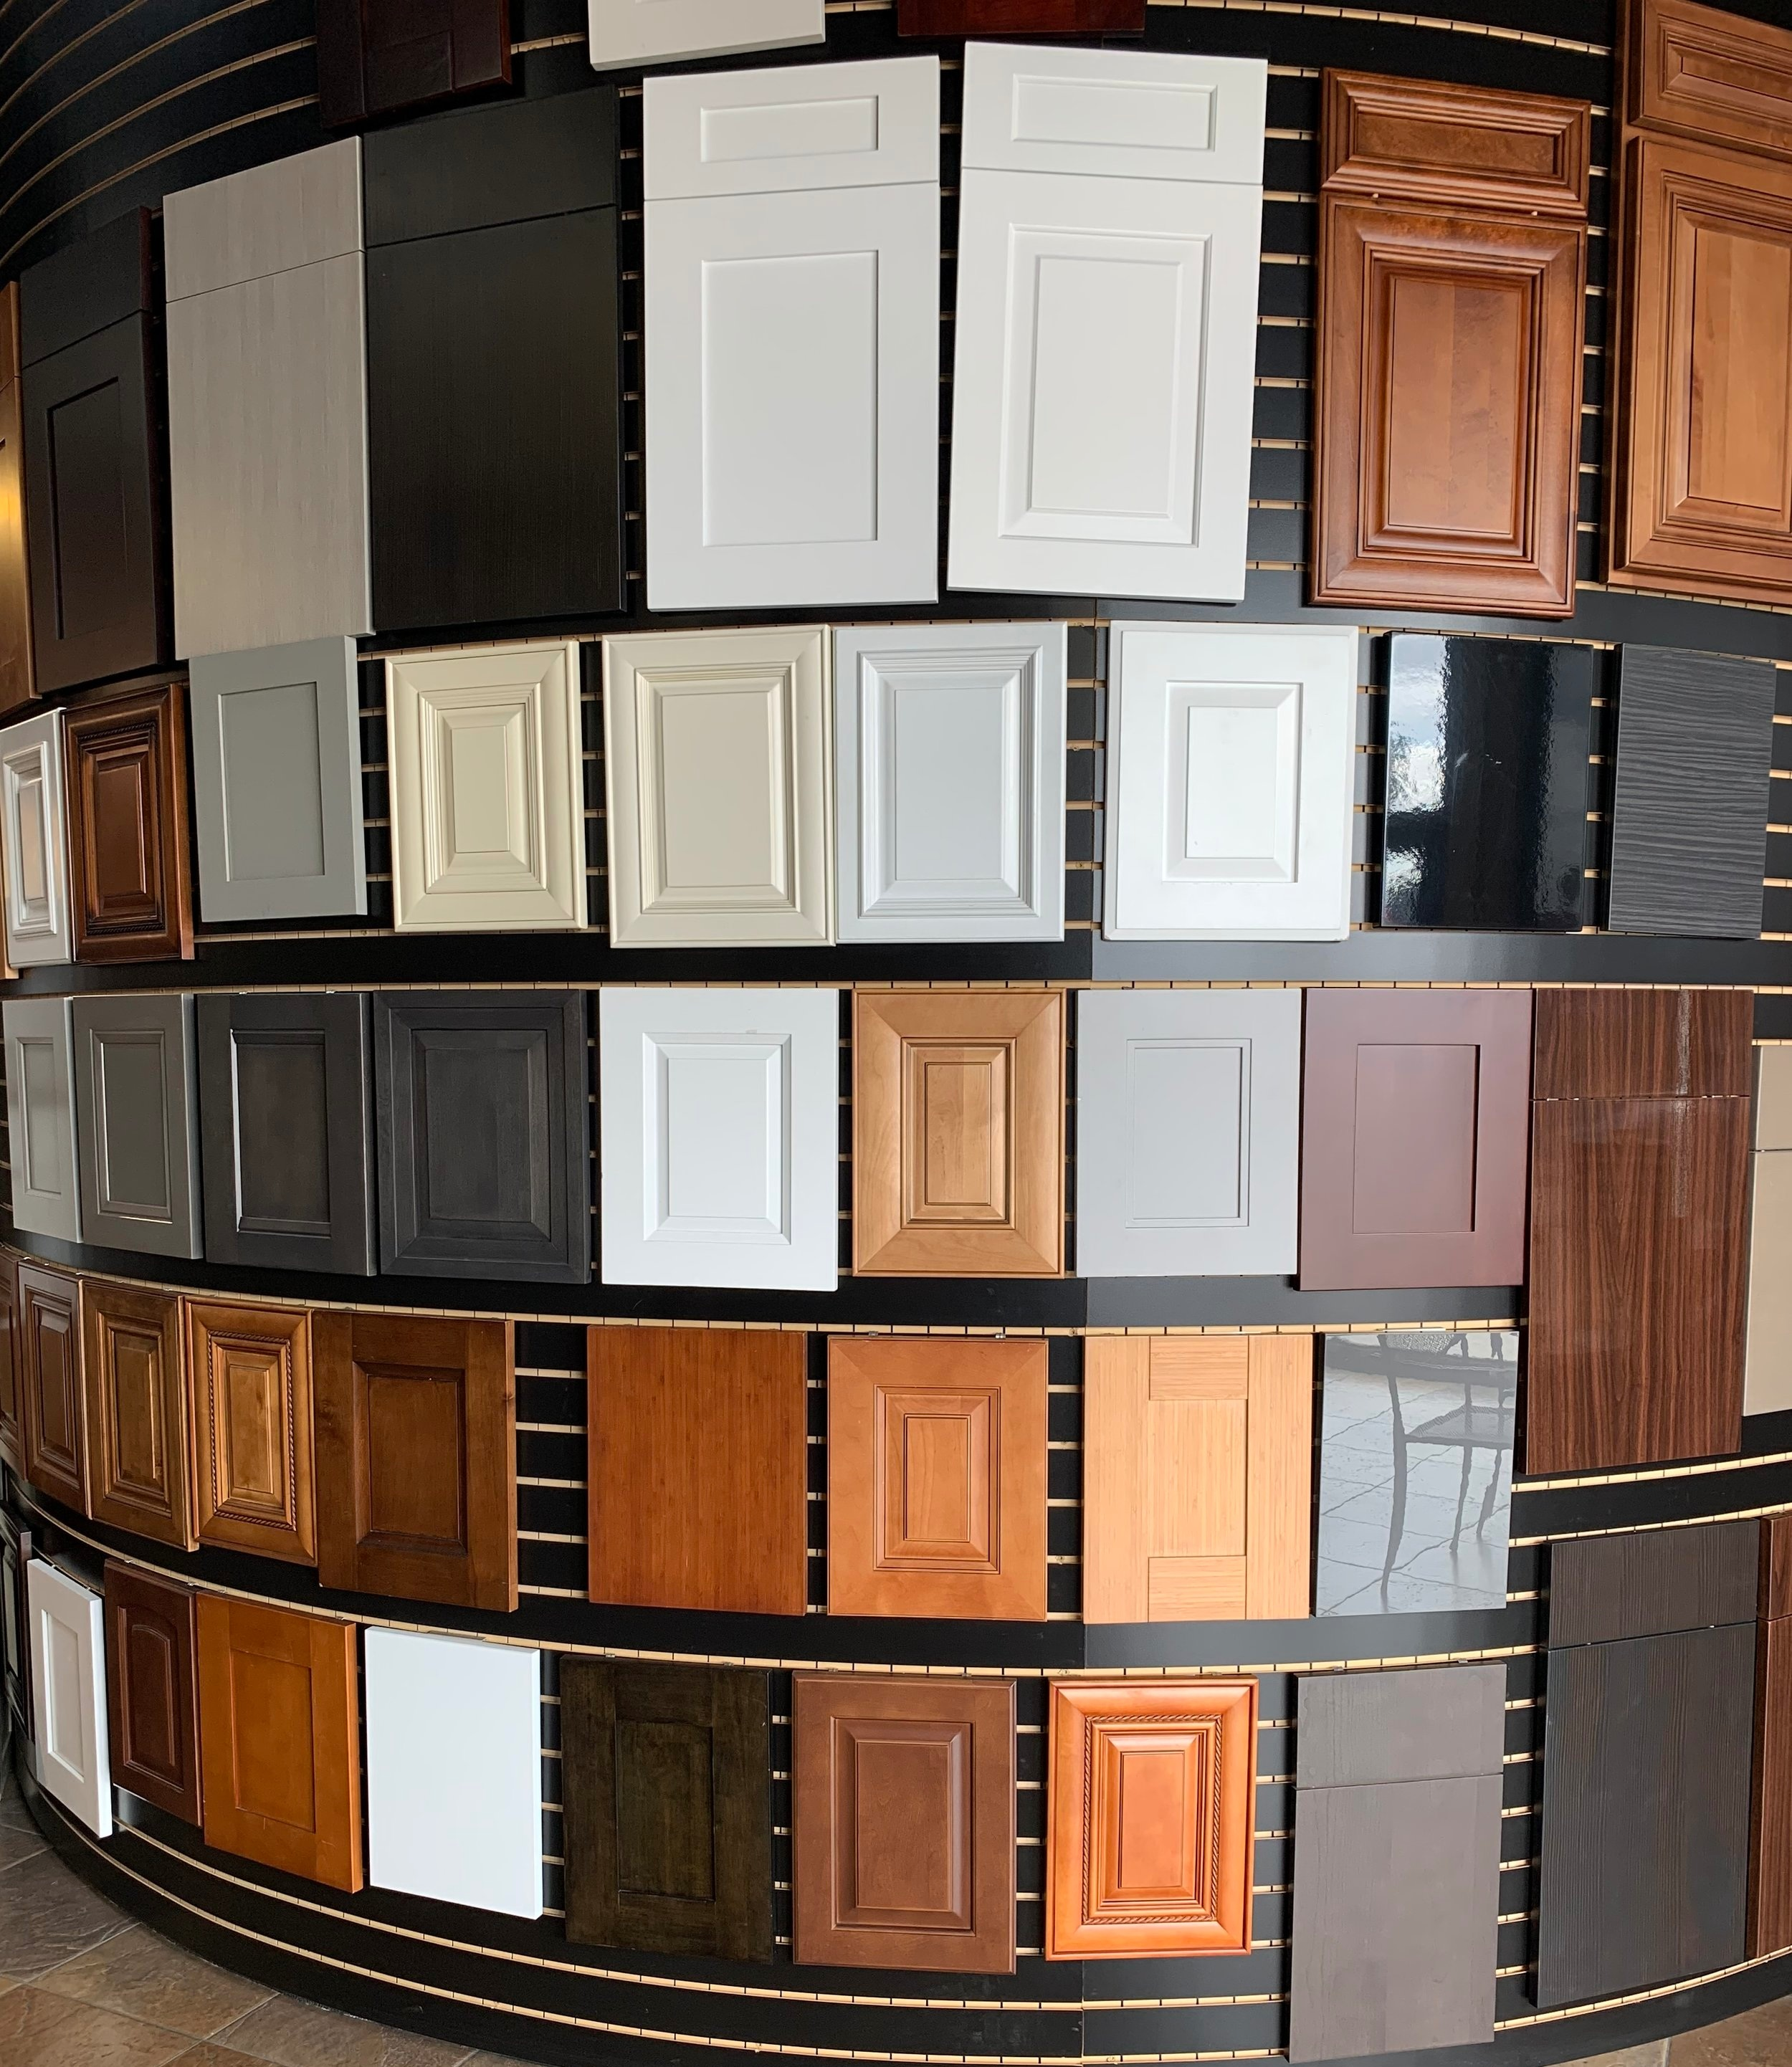 cabinet+wall1.jpg